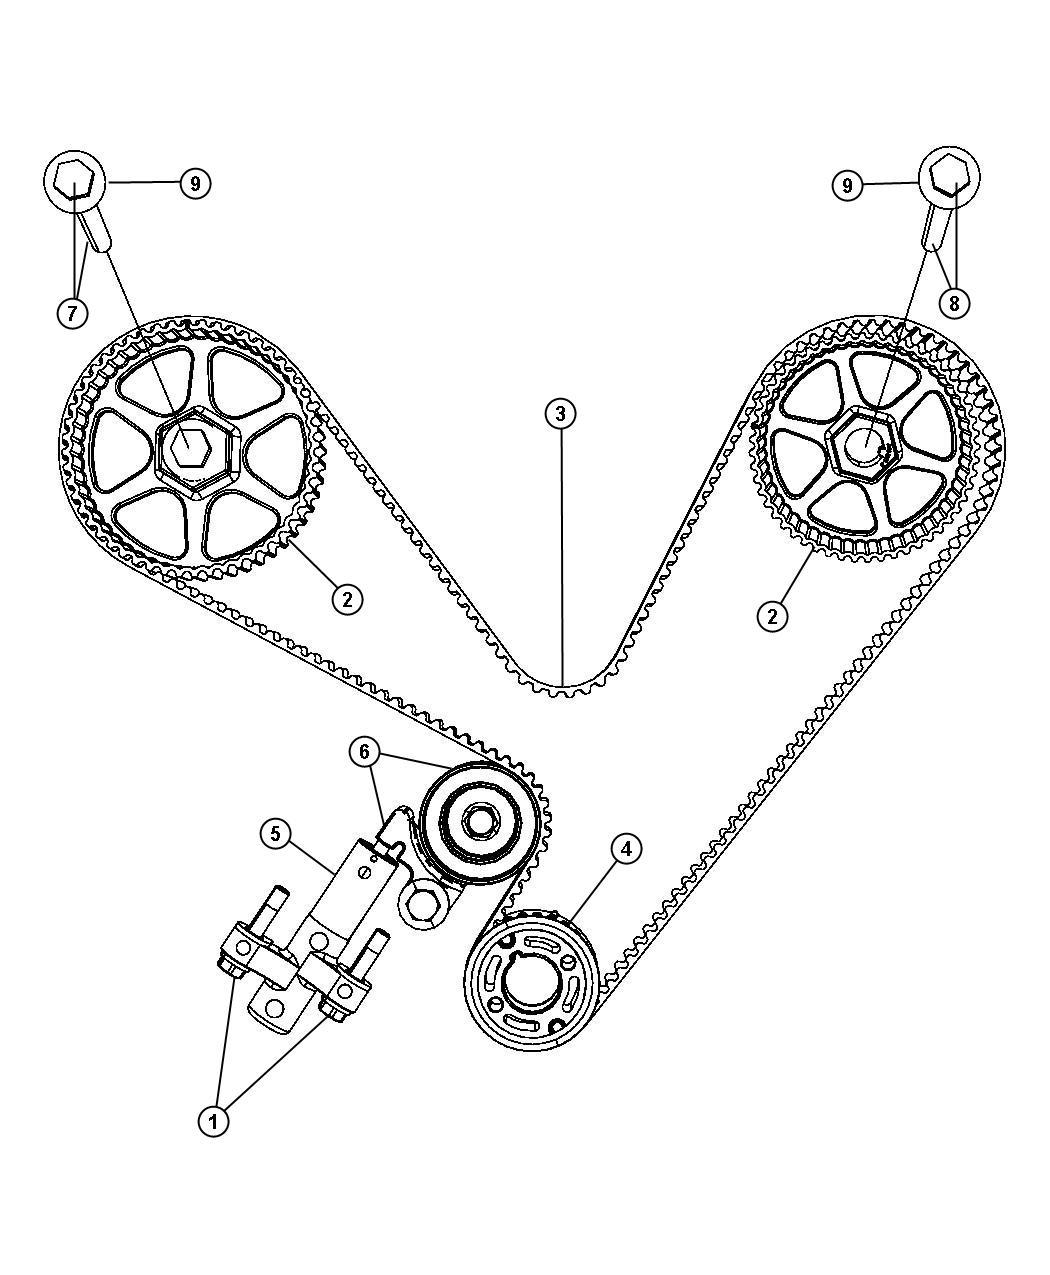 Chrysler Pacifica Gear Sprocket Camshaft Right Right